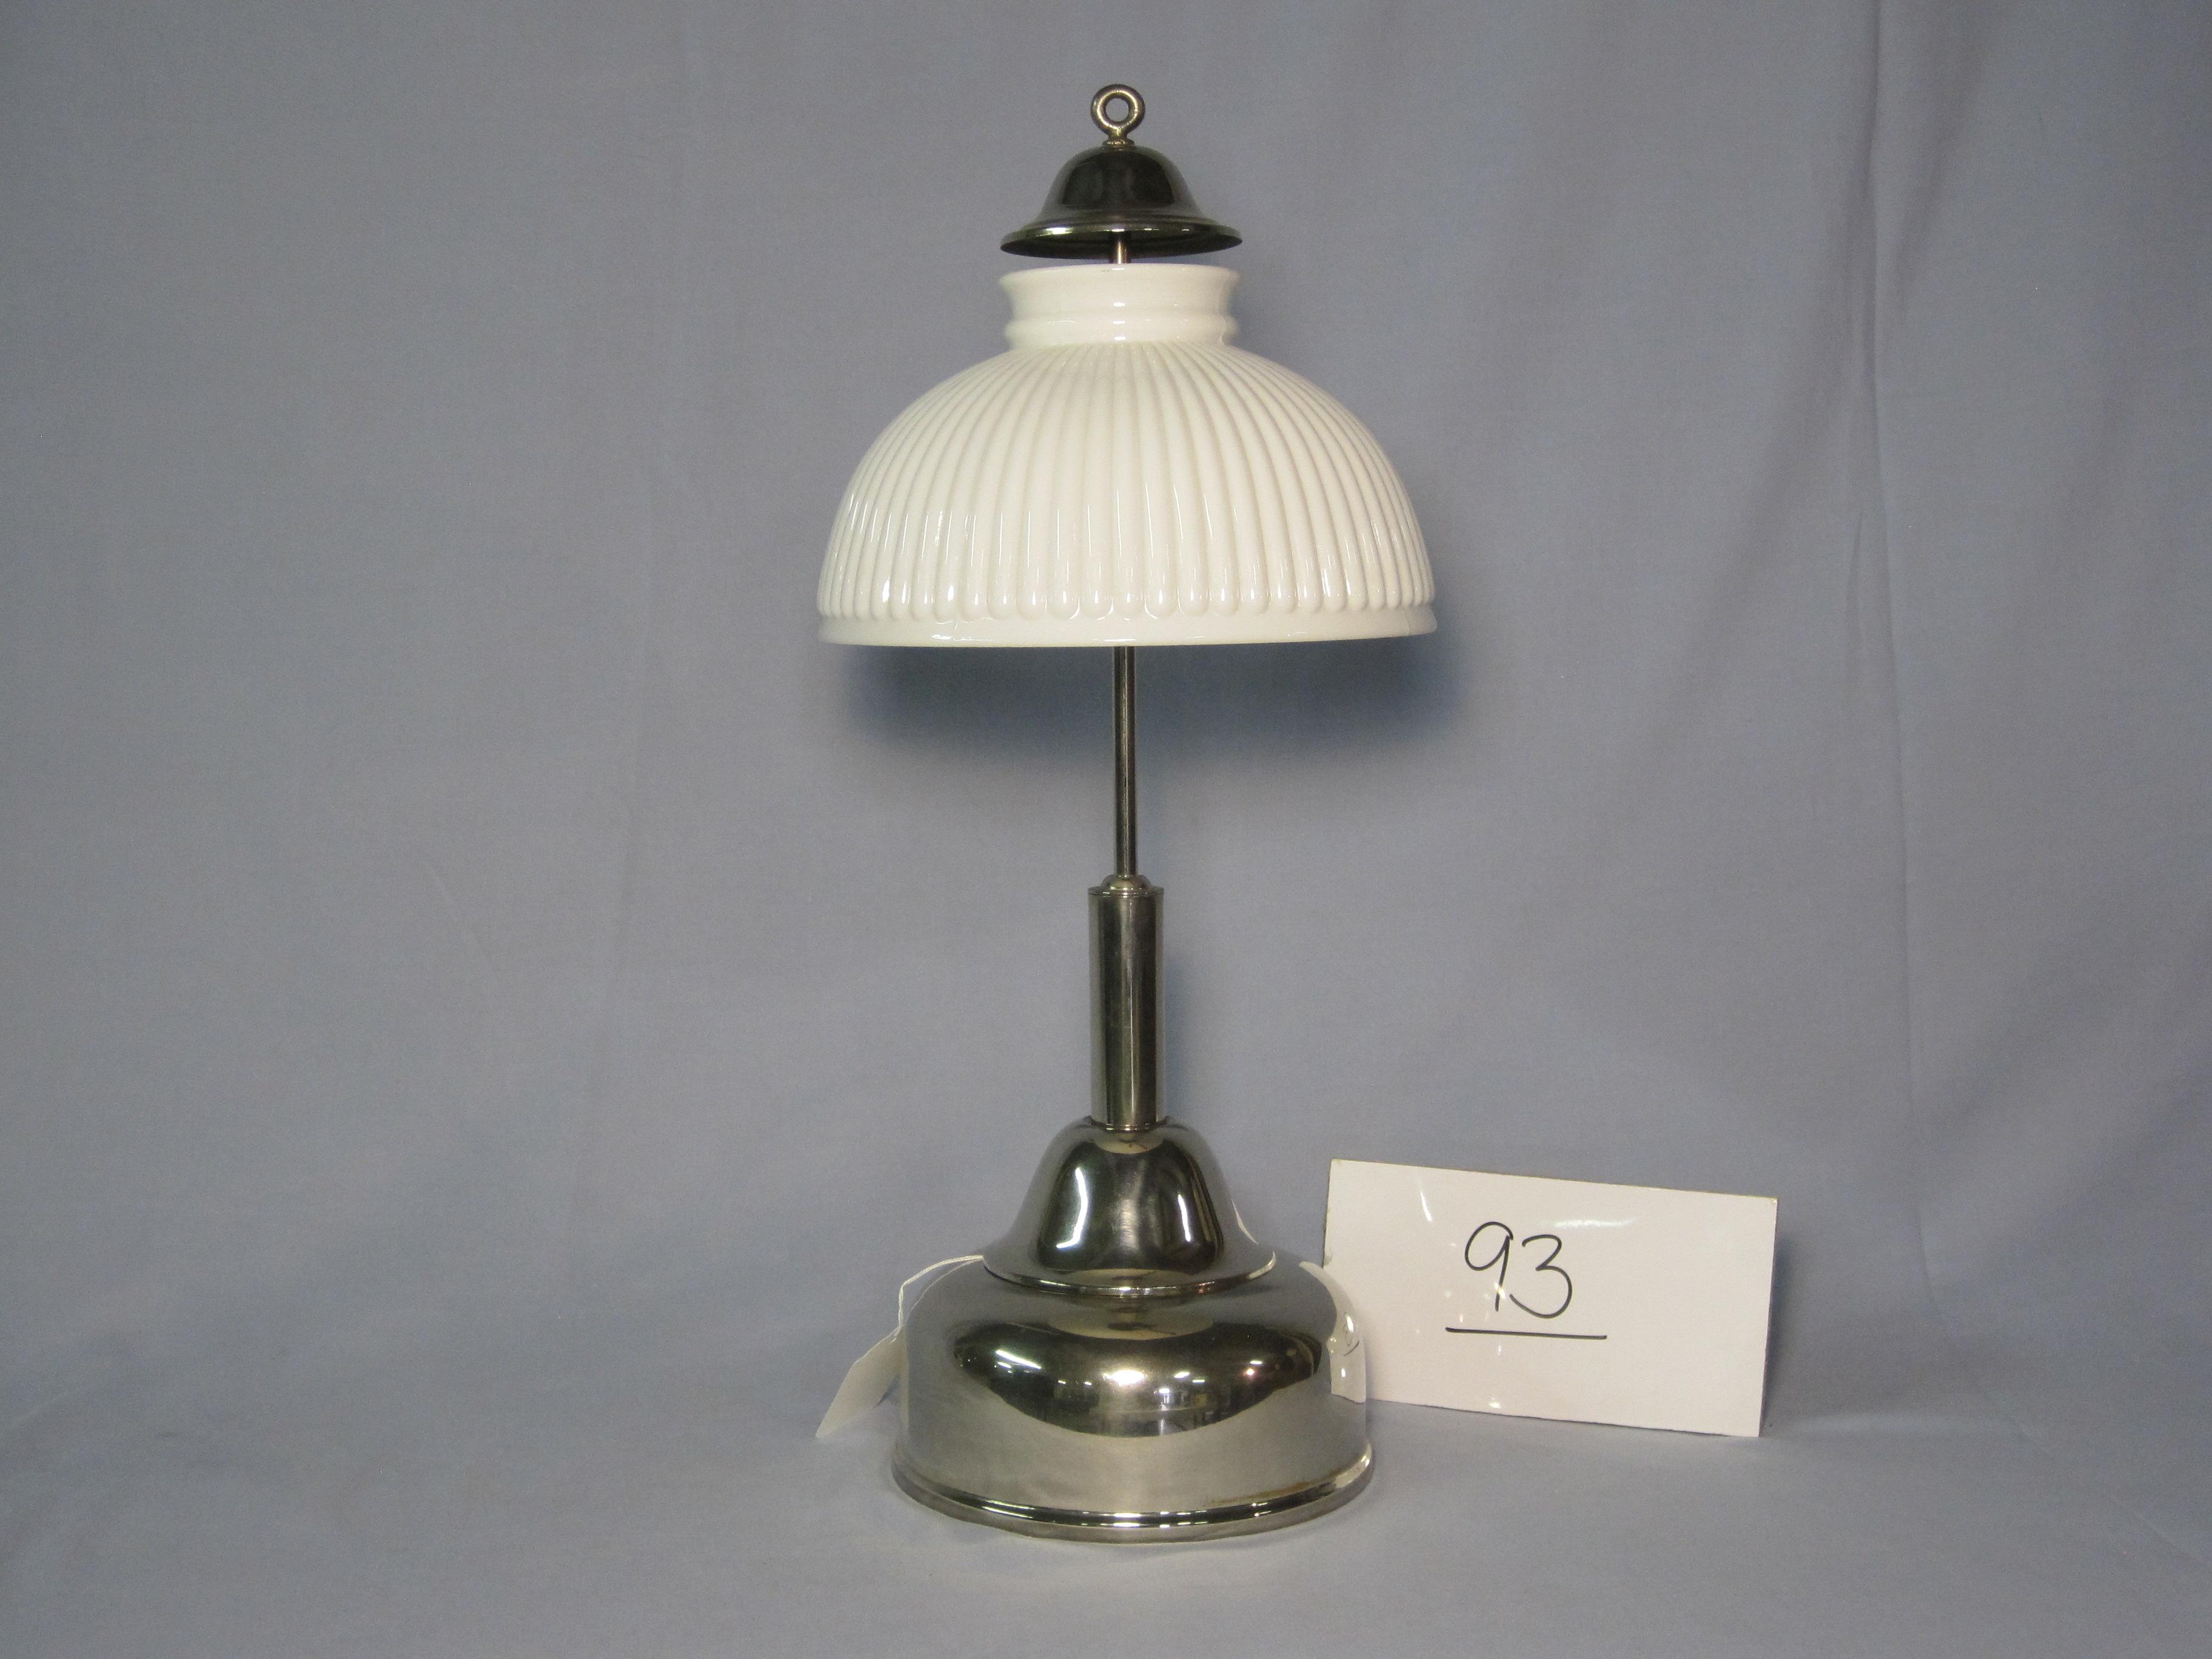 Nulite-Sunshine Safety lamp